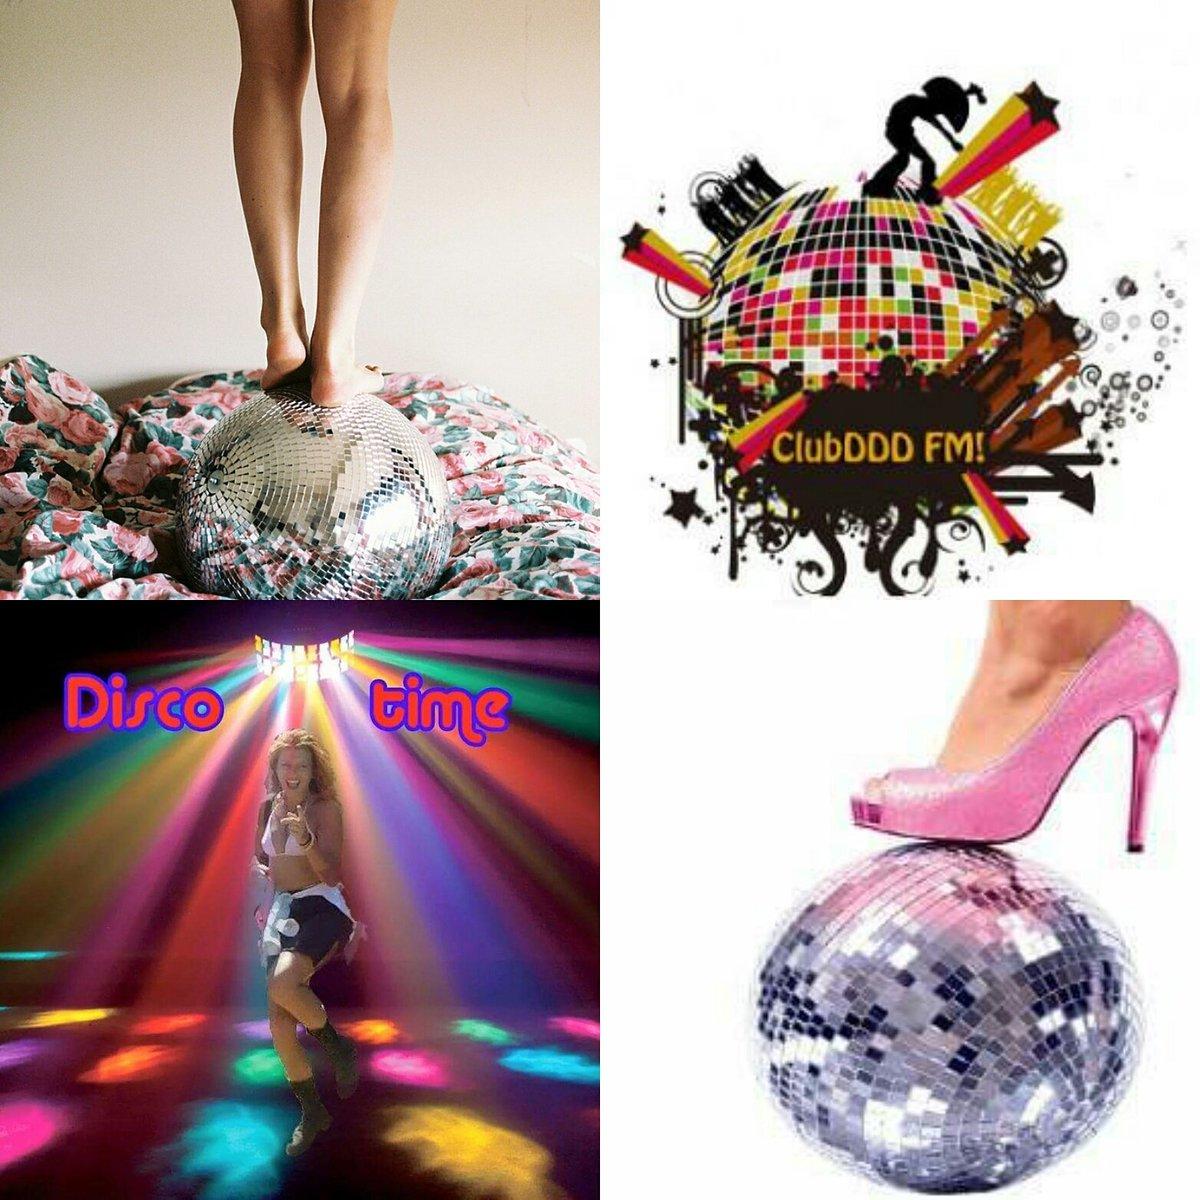 Om 12u ben ik er weer met de #DiscoTrip  http://www. clubddd.nl  &nbsp;   #stream #disco #funky #soul<br>http://pic.twitter.com/pmzWEAE134